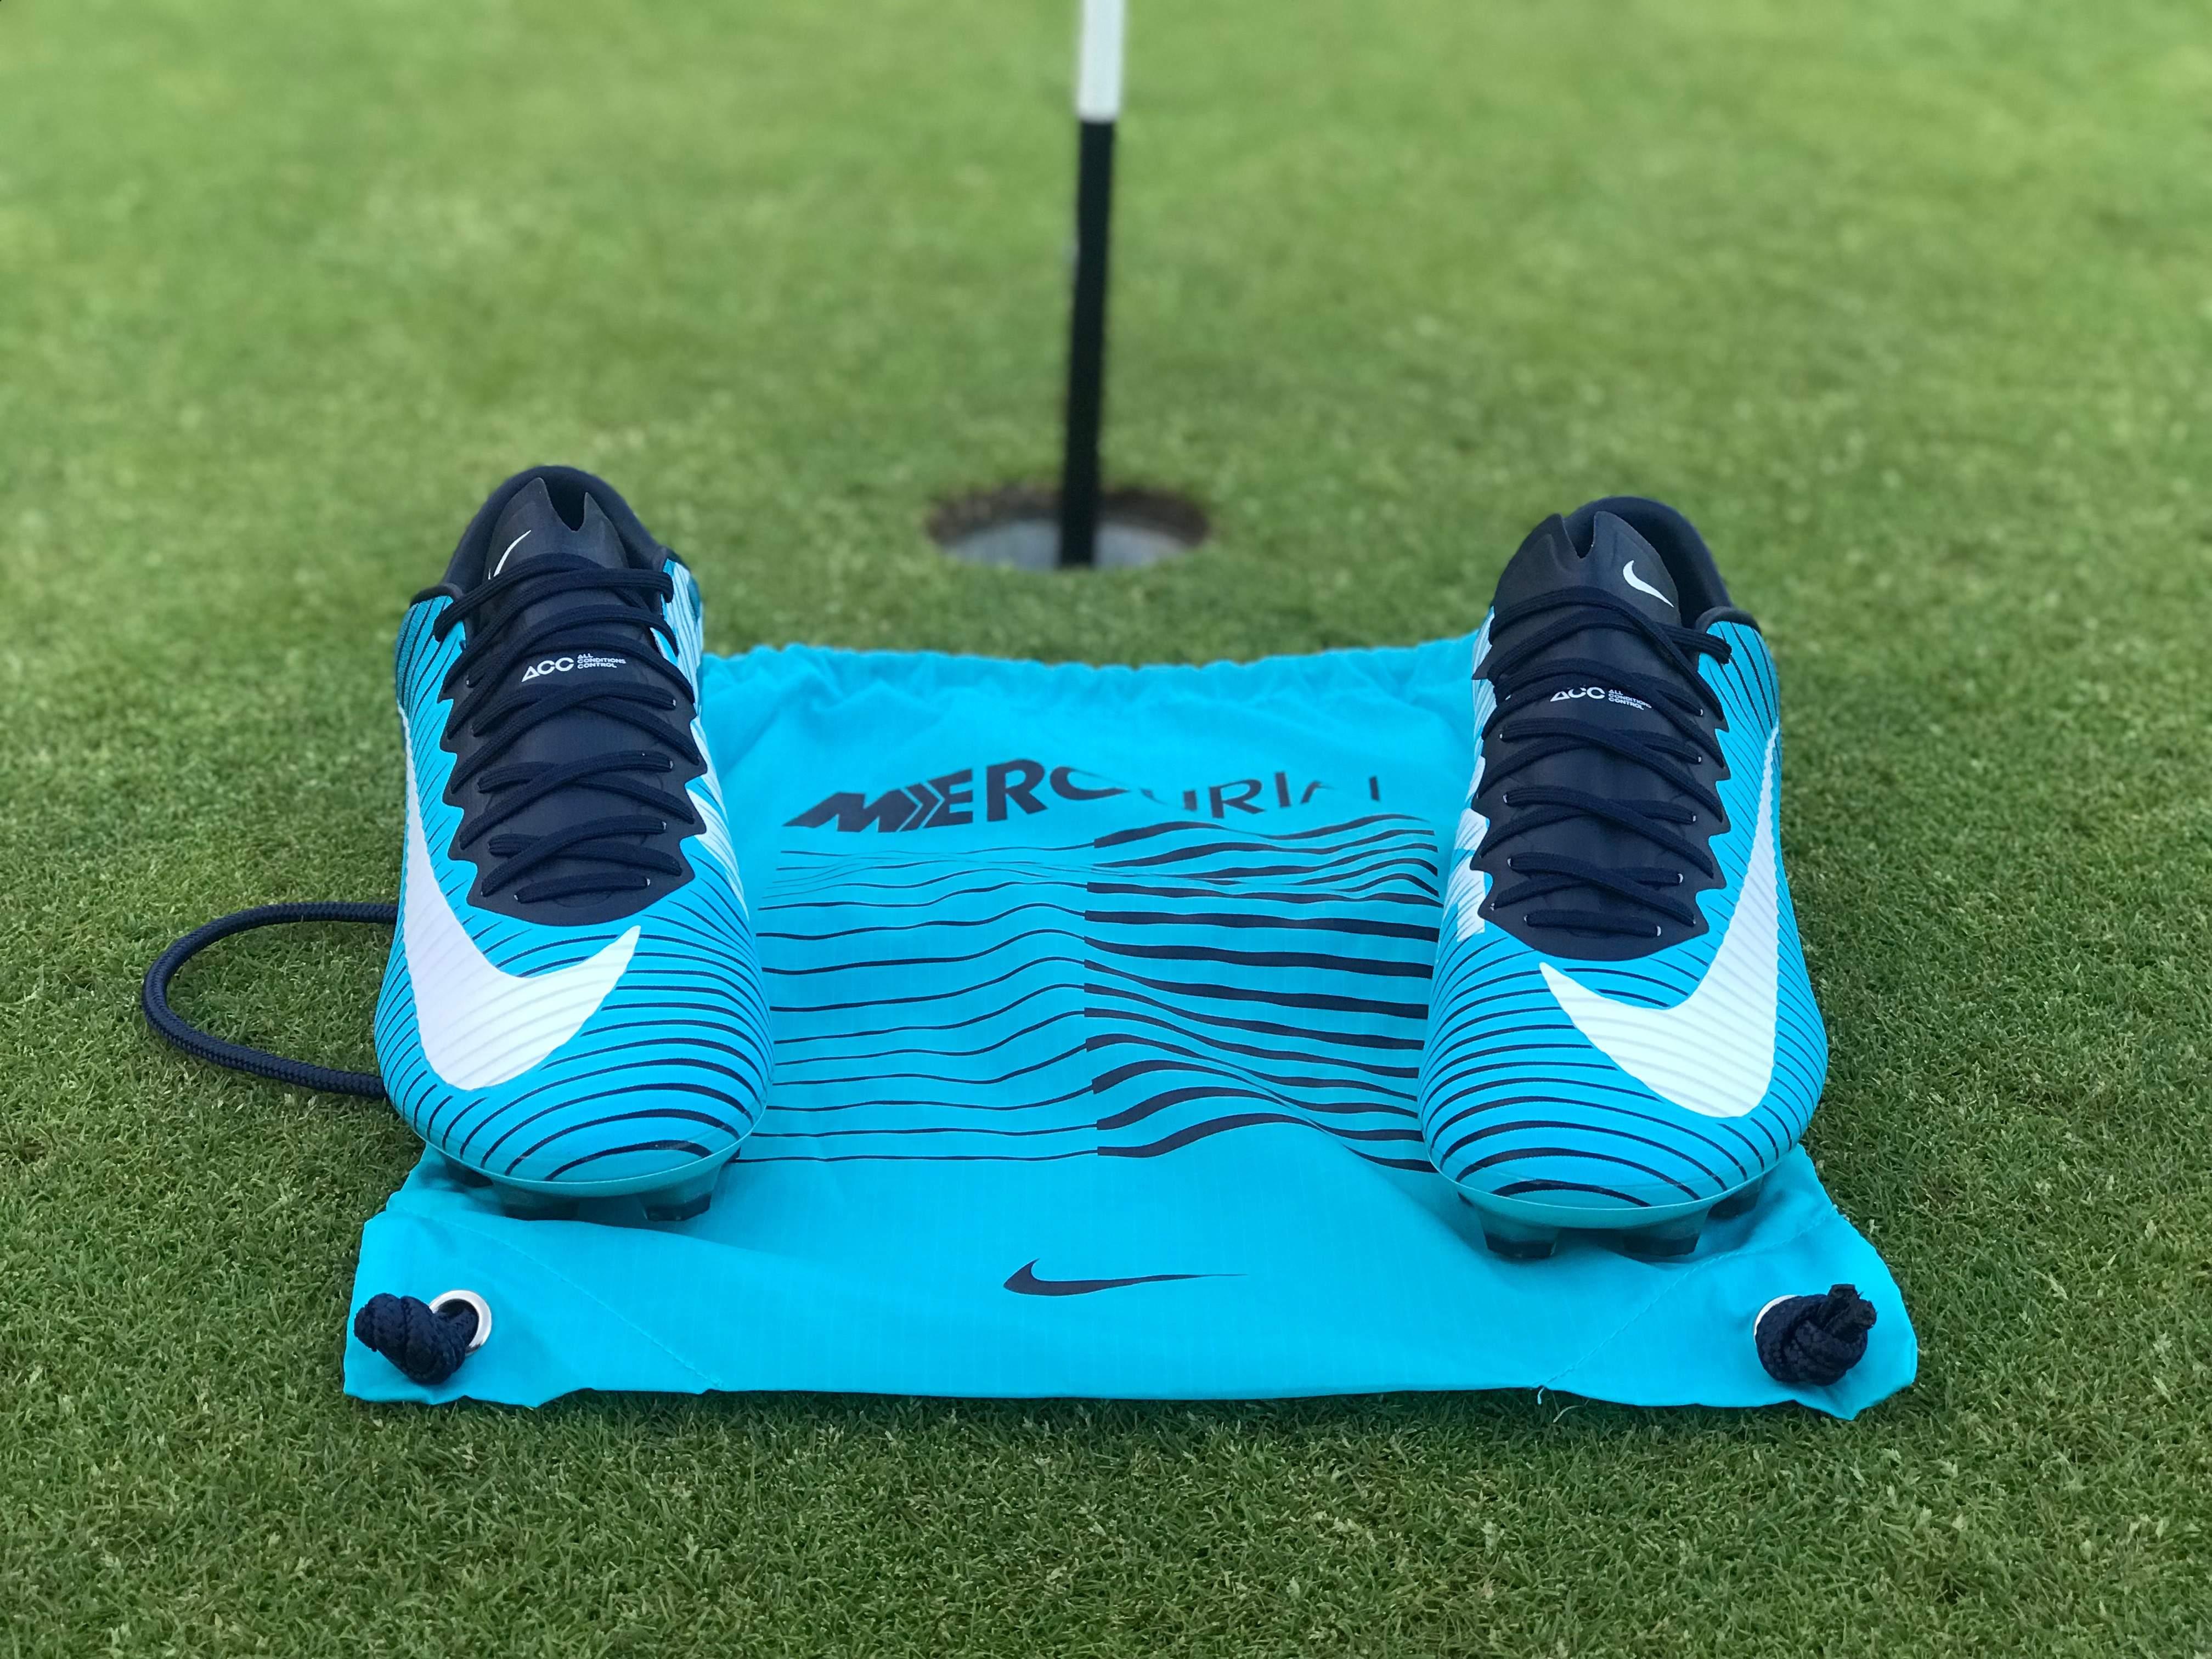 Nike Air Vapormax Flyknit 3 Oreo (2019) in 2019 Nike